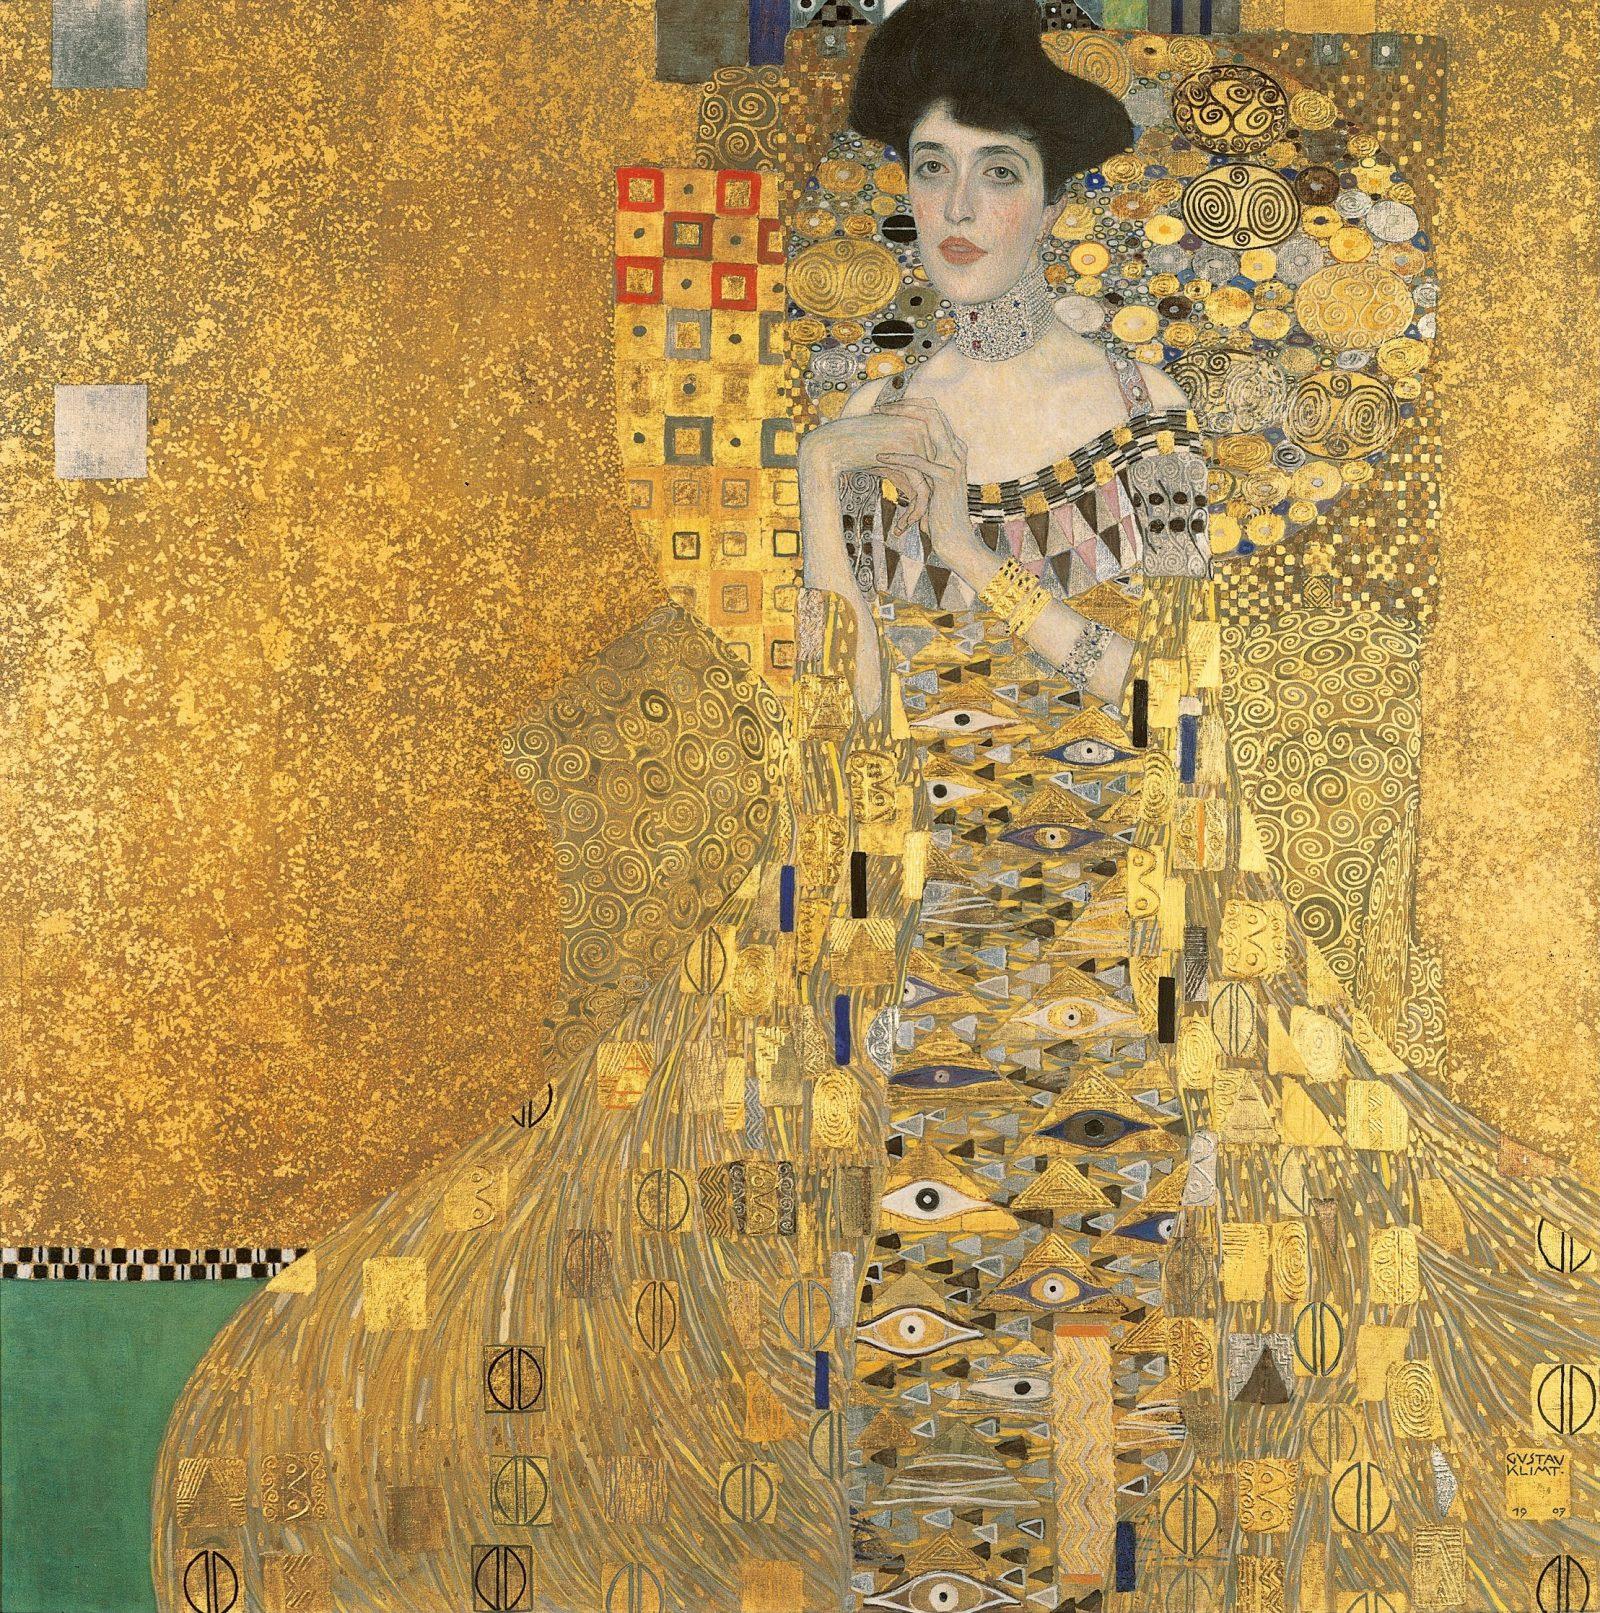 Neue Galerie New York - _Adele Bloch Bauer I_ 1903_1907_on Google Arts & Culture